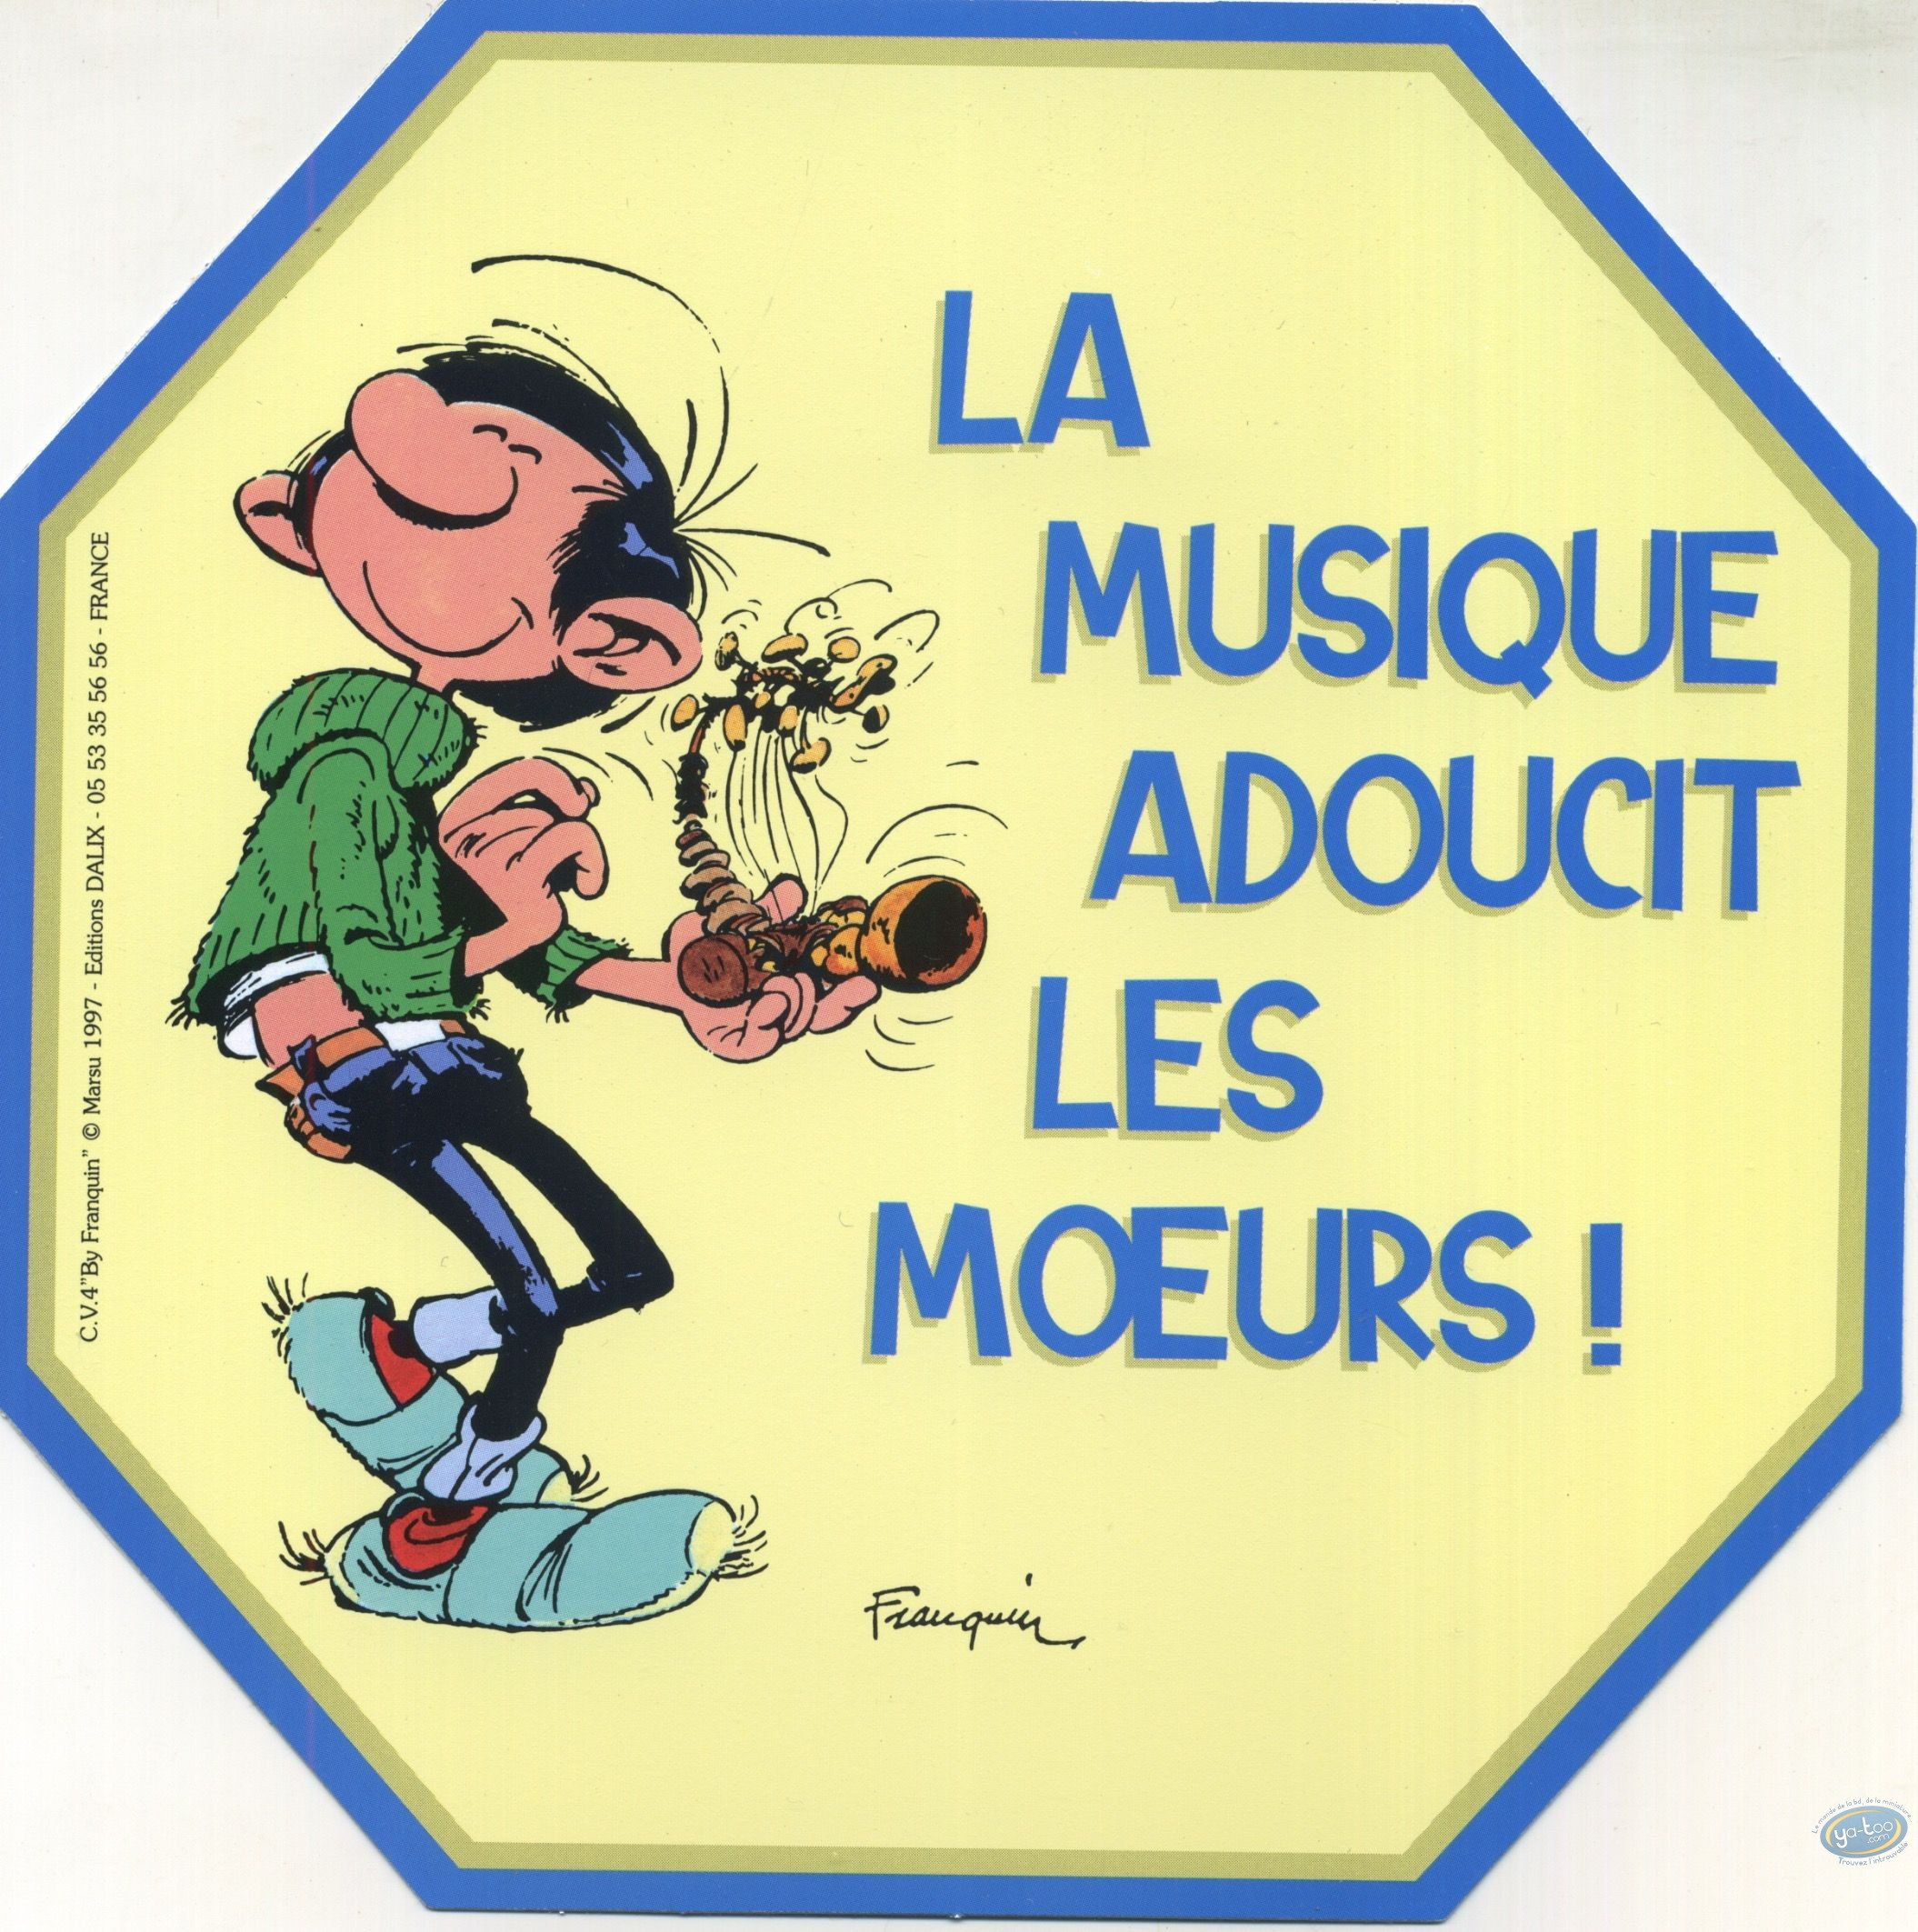 Sticker, Gaston Lagaffe : The music softens the customs